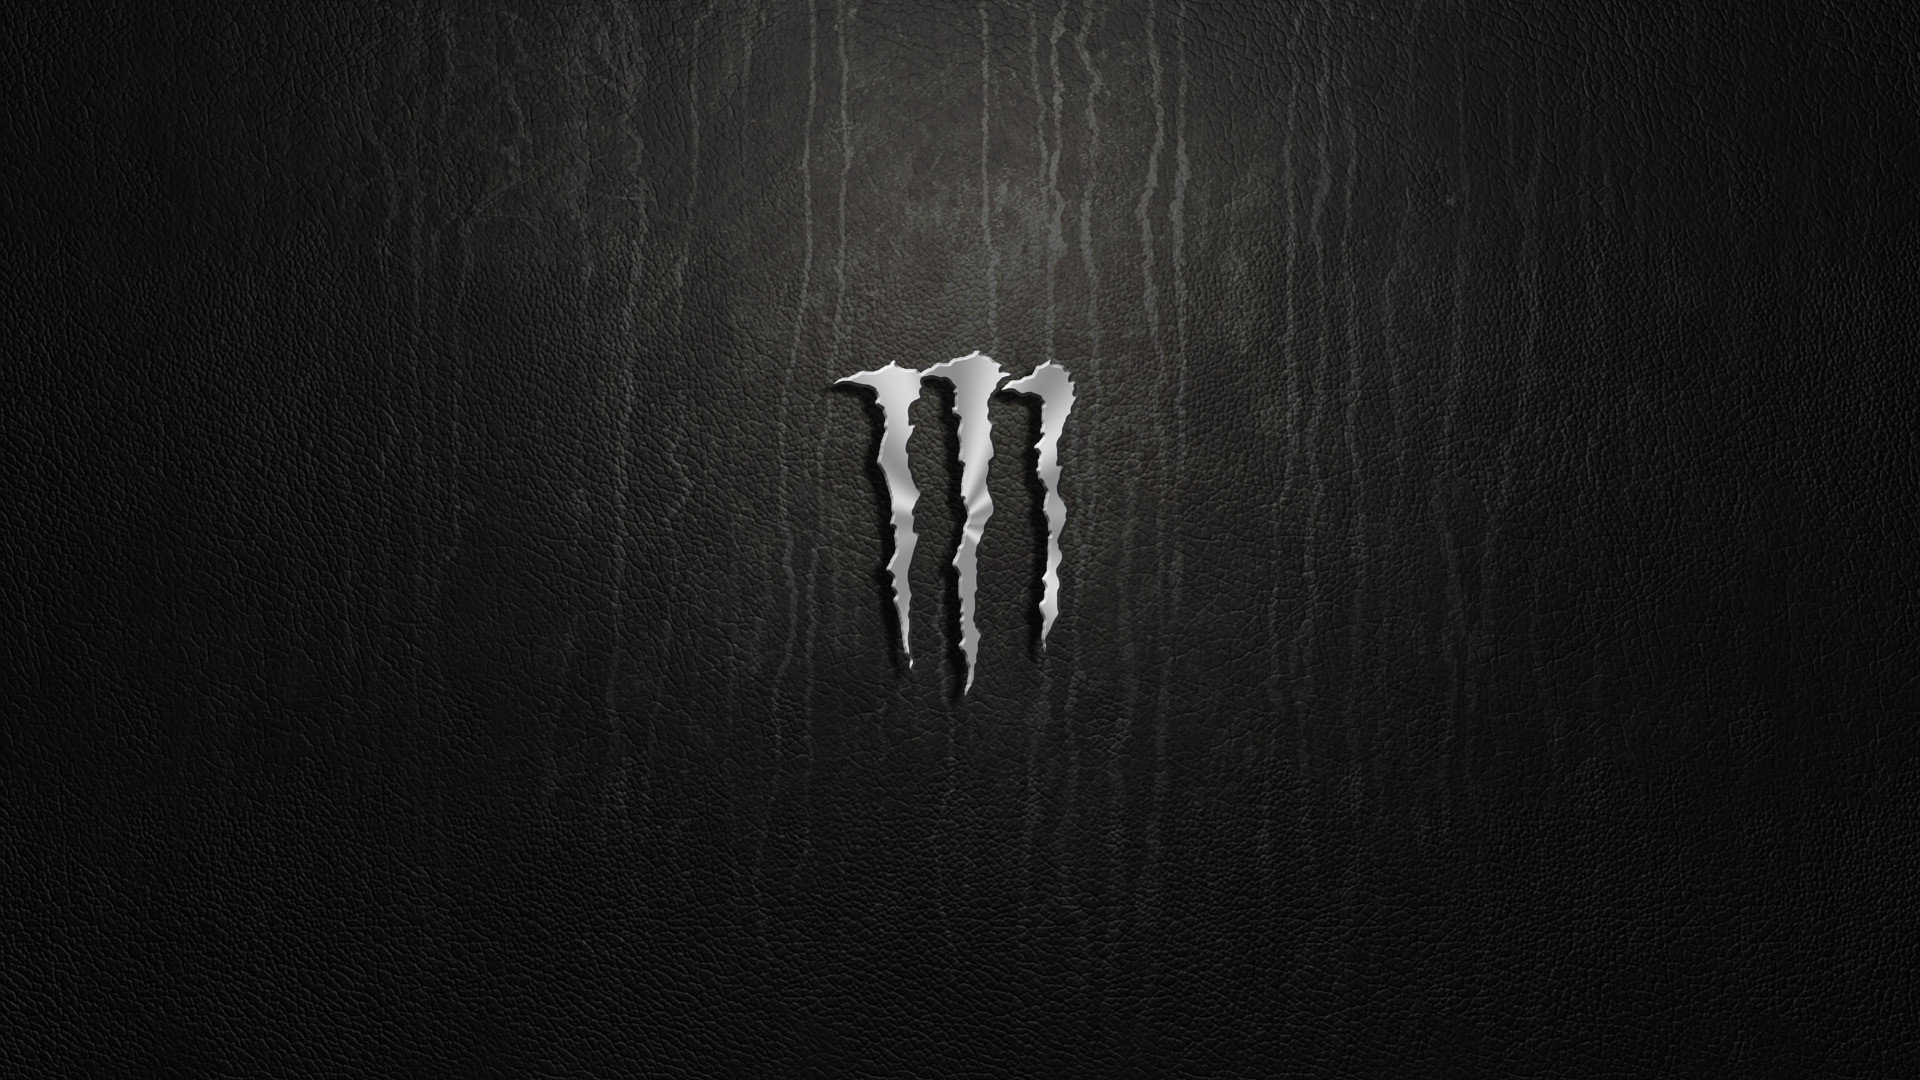 Monster Energy wallpapers 1920x1080